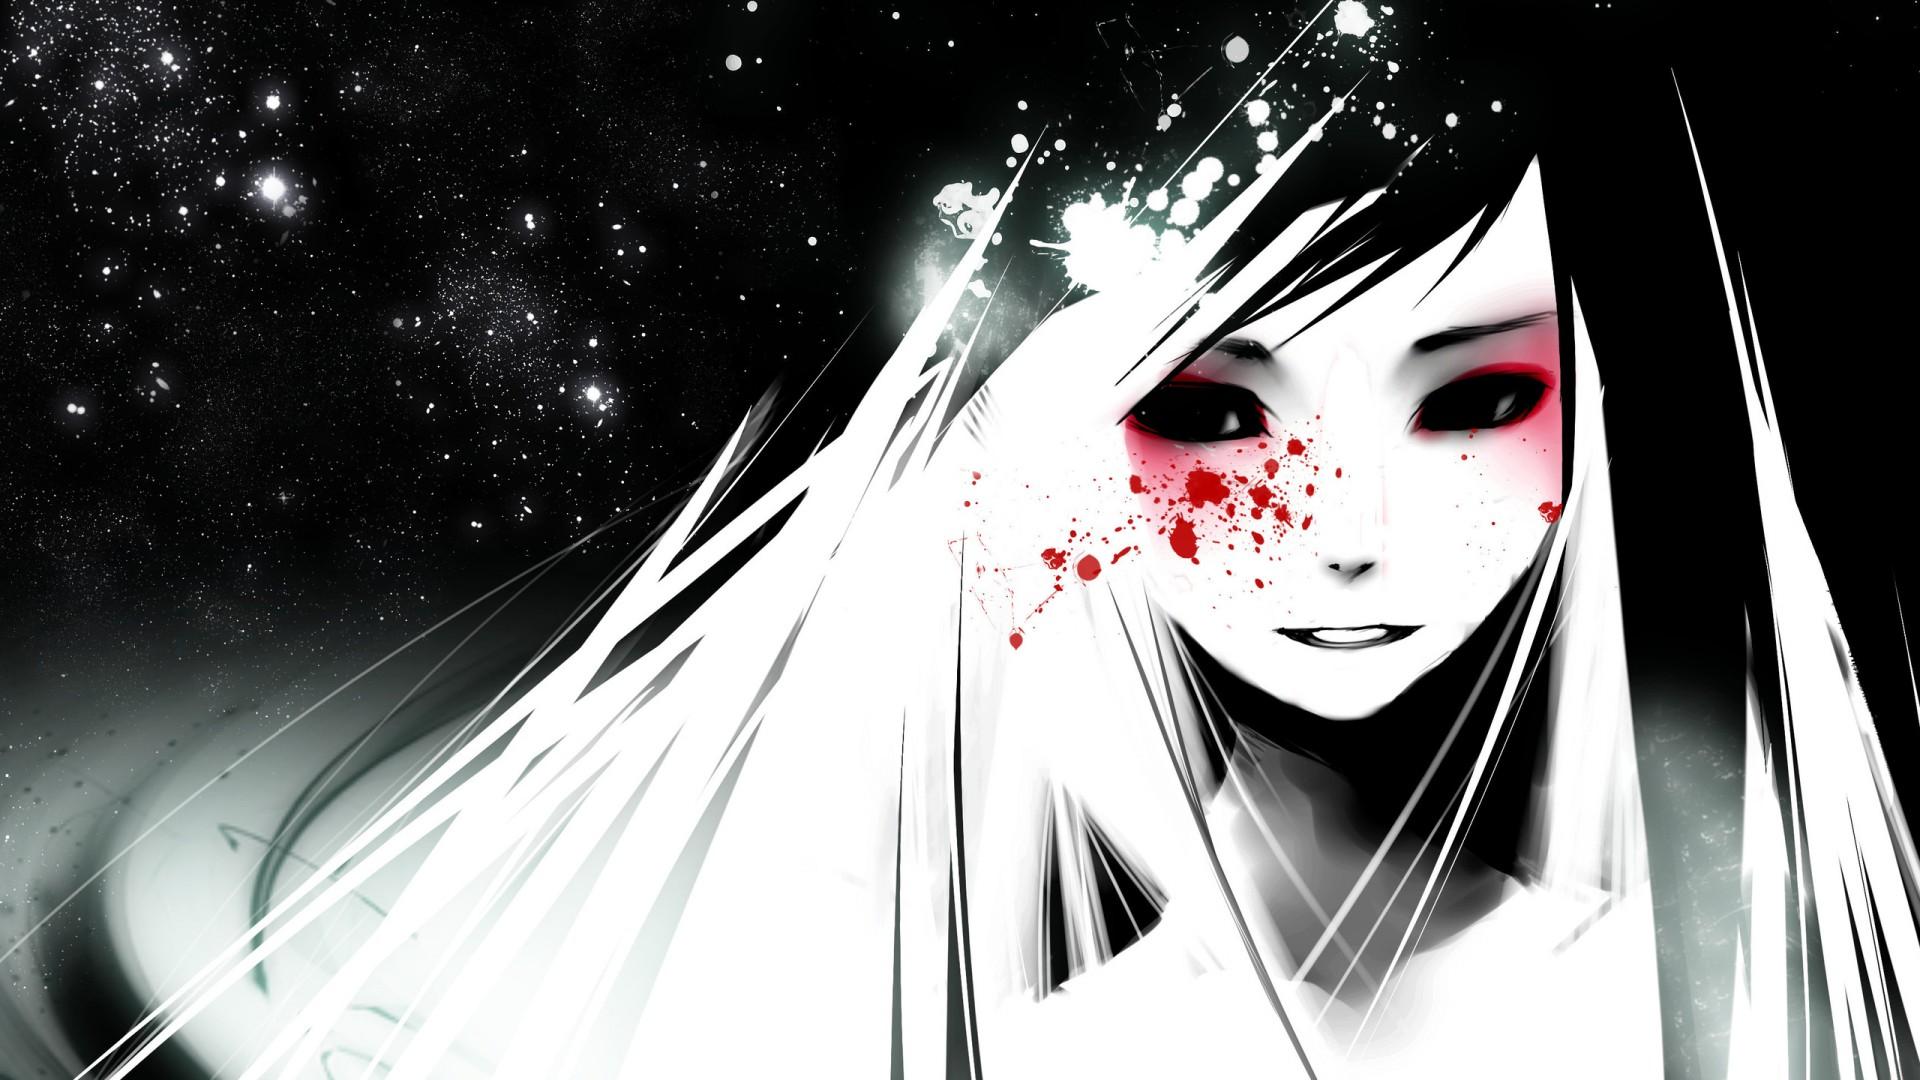 Download dark anime cartoon girl hd image HD wallpaper 1920x1080